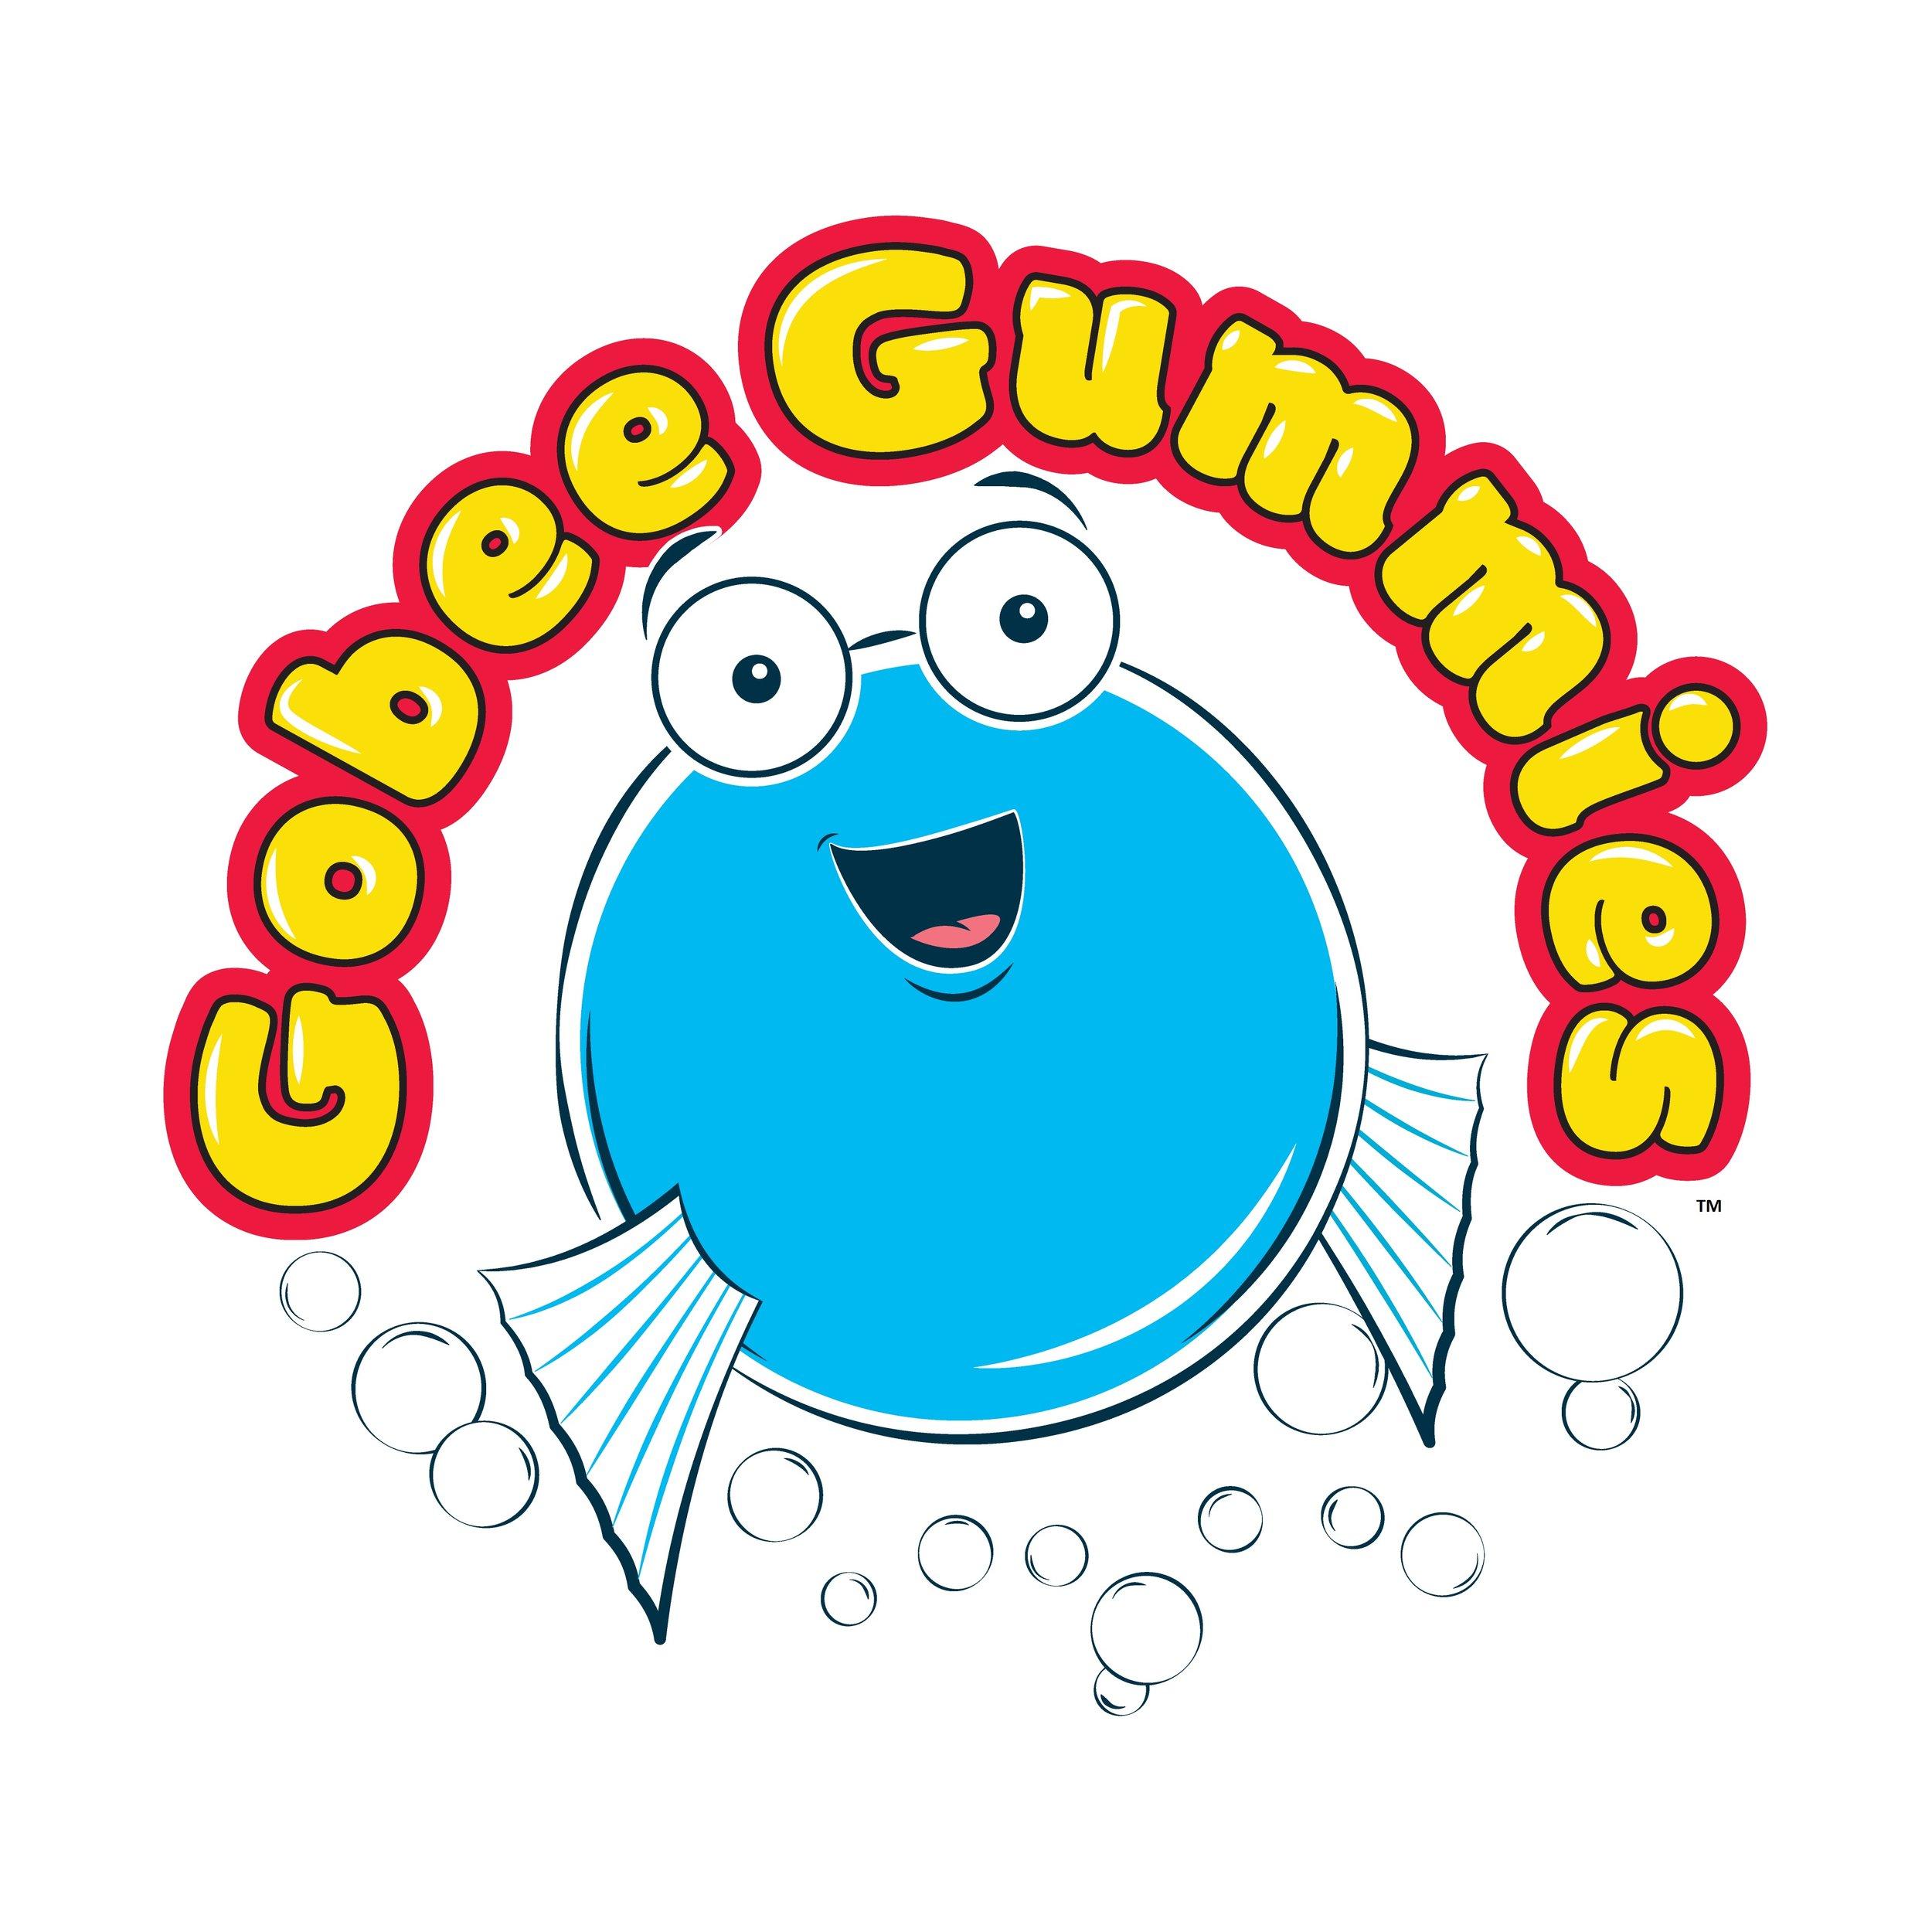 GG_Bubbles_TM_HRes.jpg